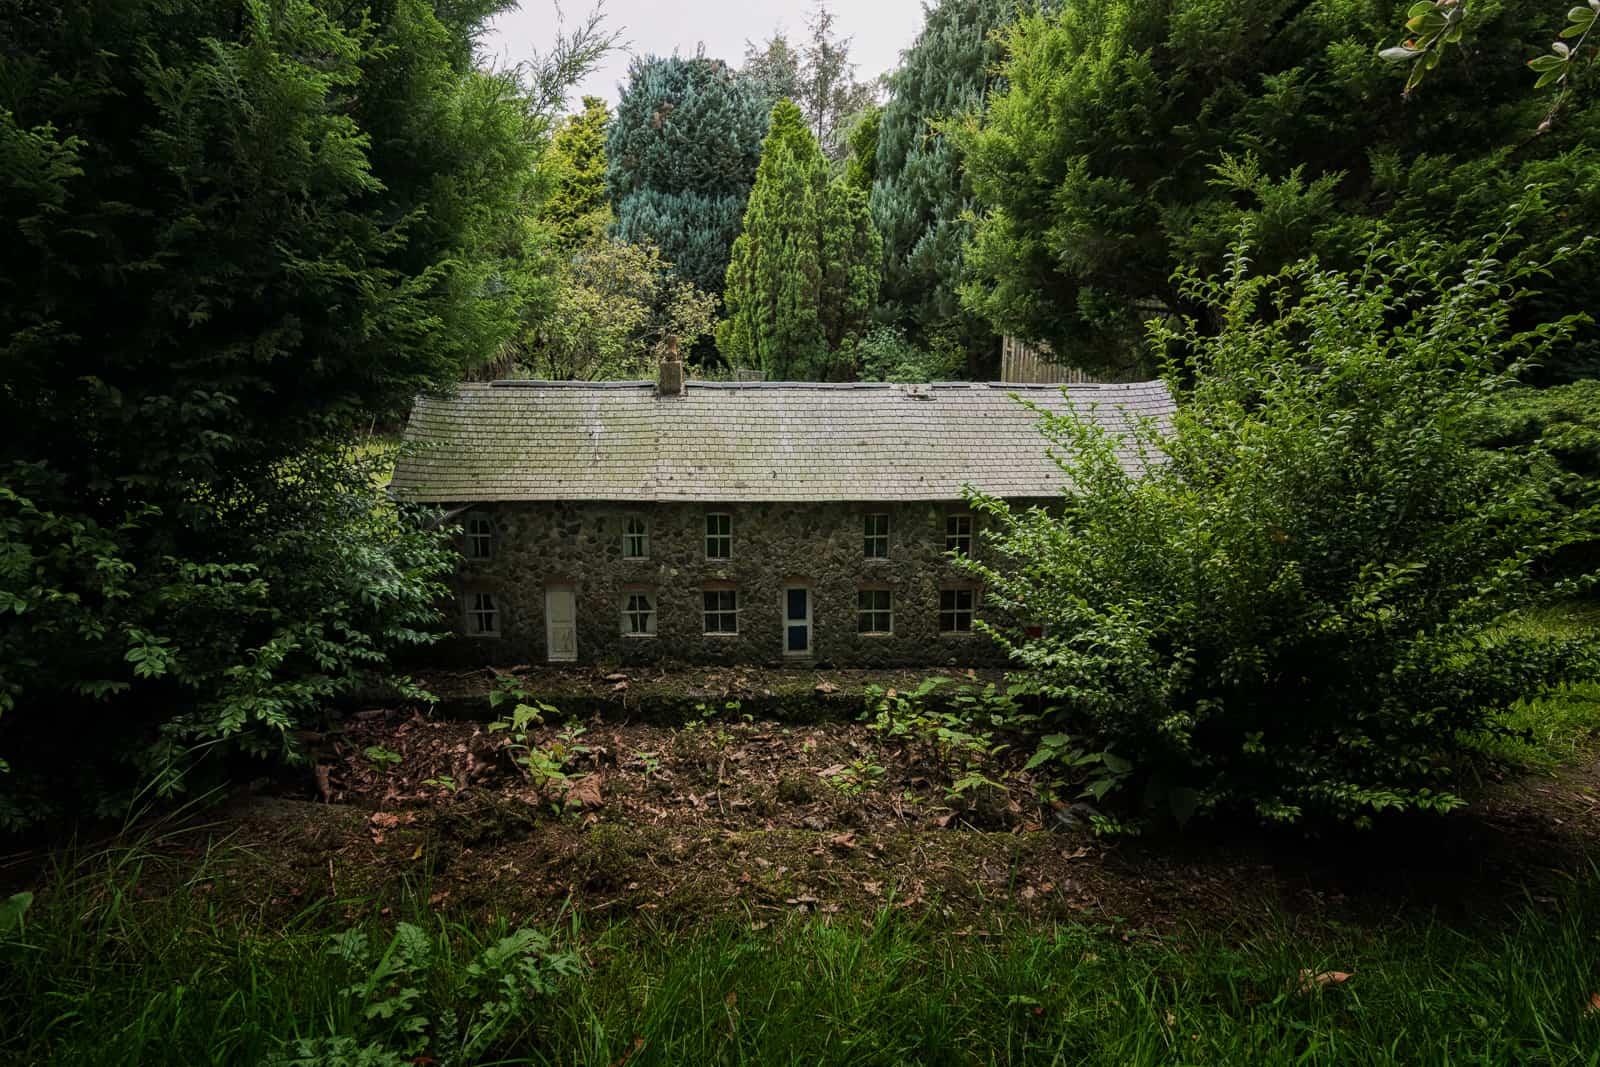 Forgotten Model Village, Wales - Obsidian Urbex Photography | Urban Exploration